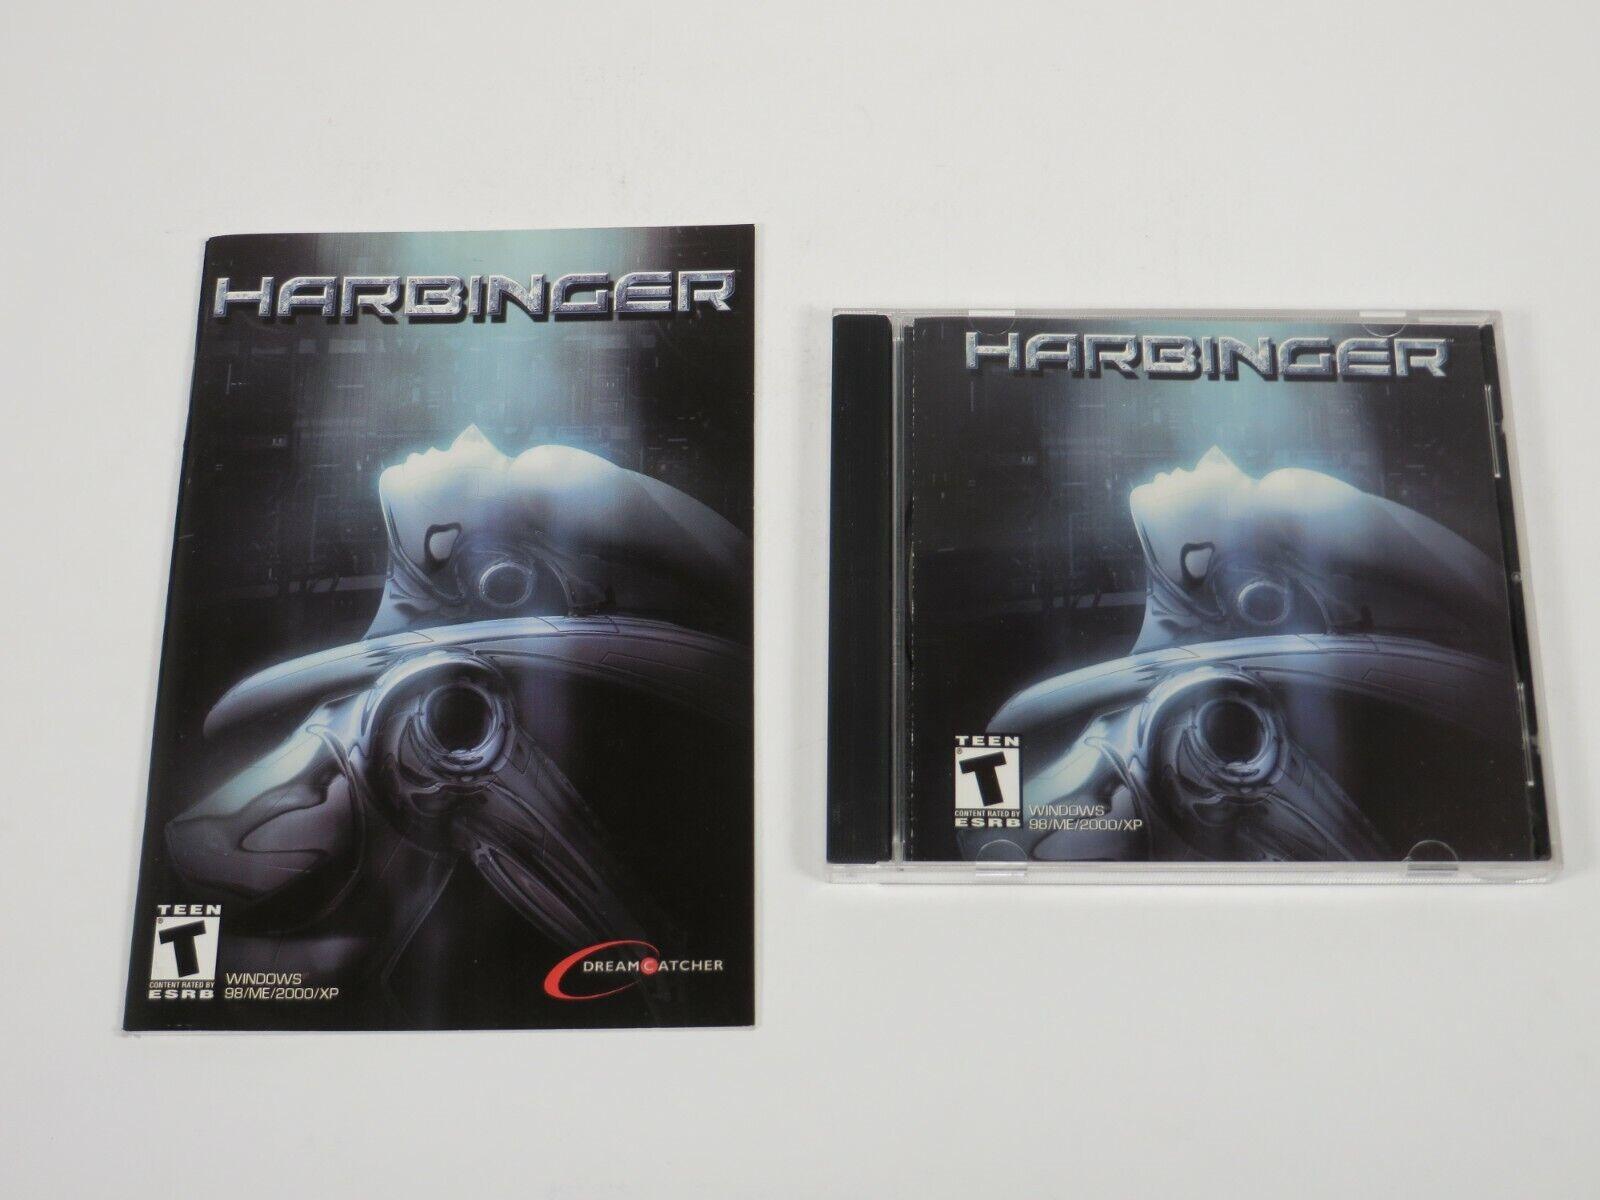 Computer Games - Harbinger (PC, 2003) PC Vintage Computer Game DreamCatcher